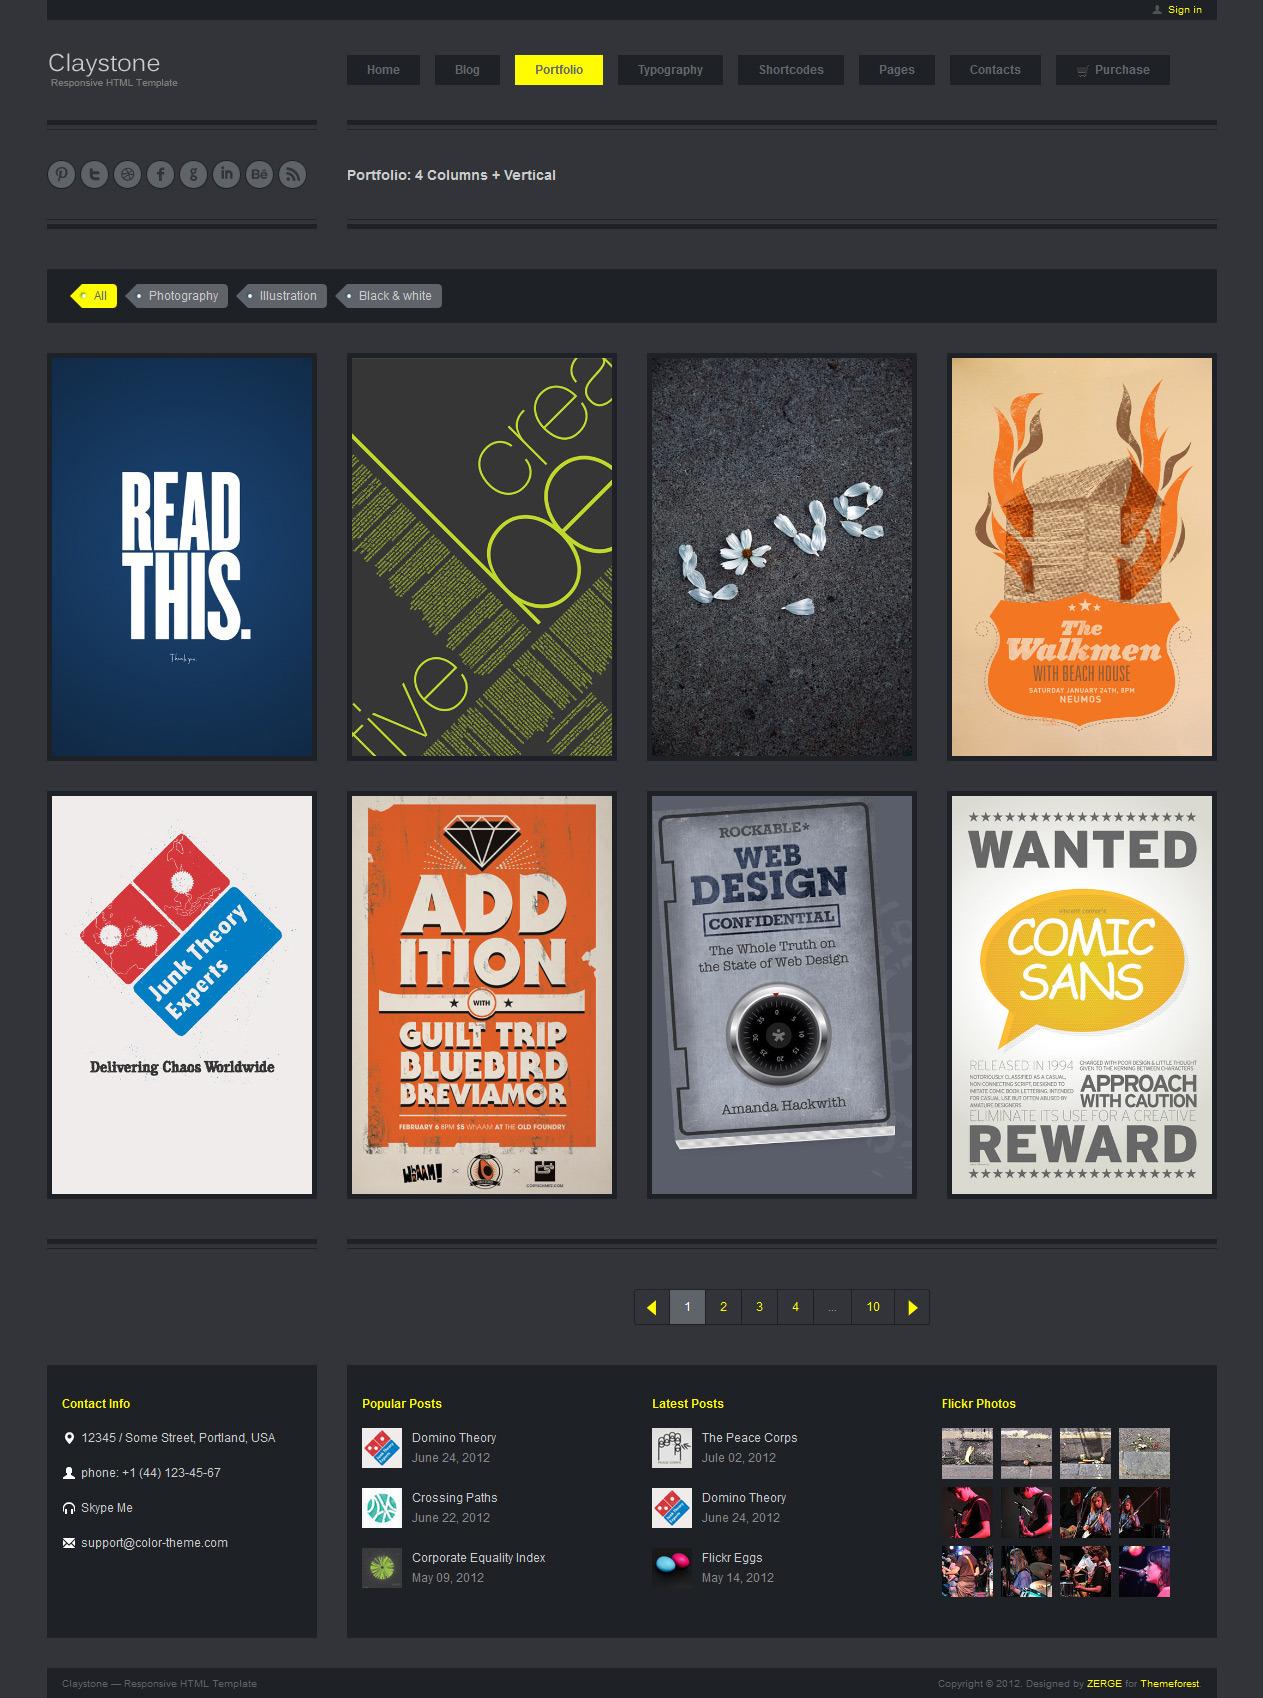 Claystone - Responsive HTML Template - 09 Portfolio 4Col Ver